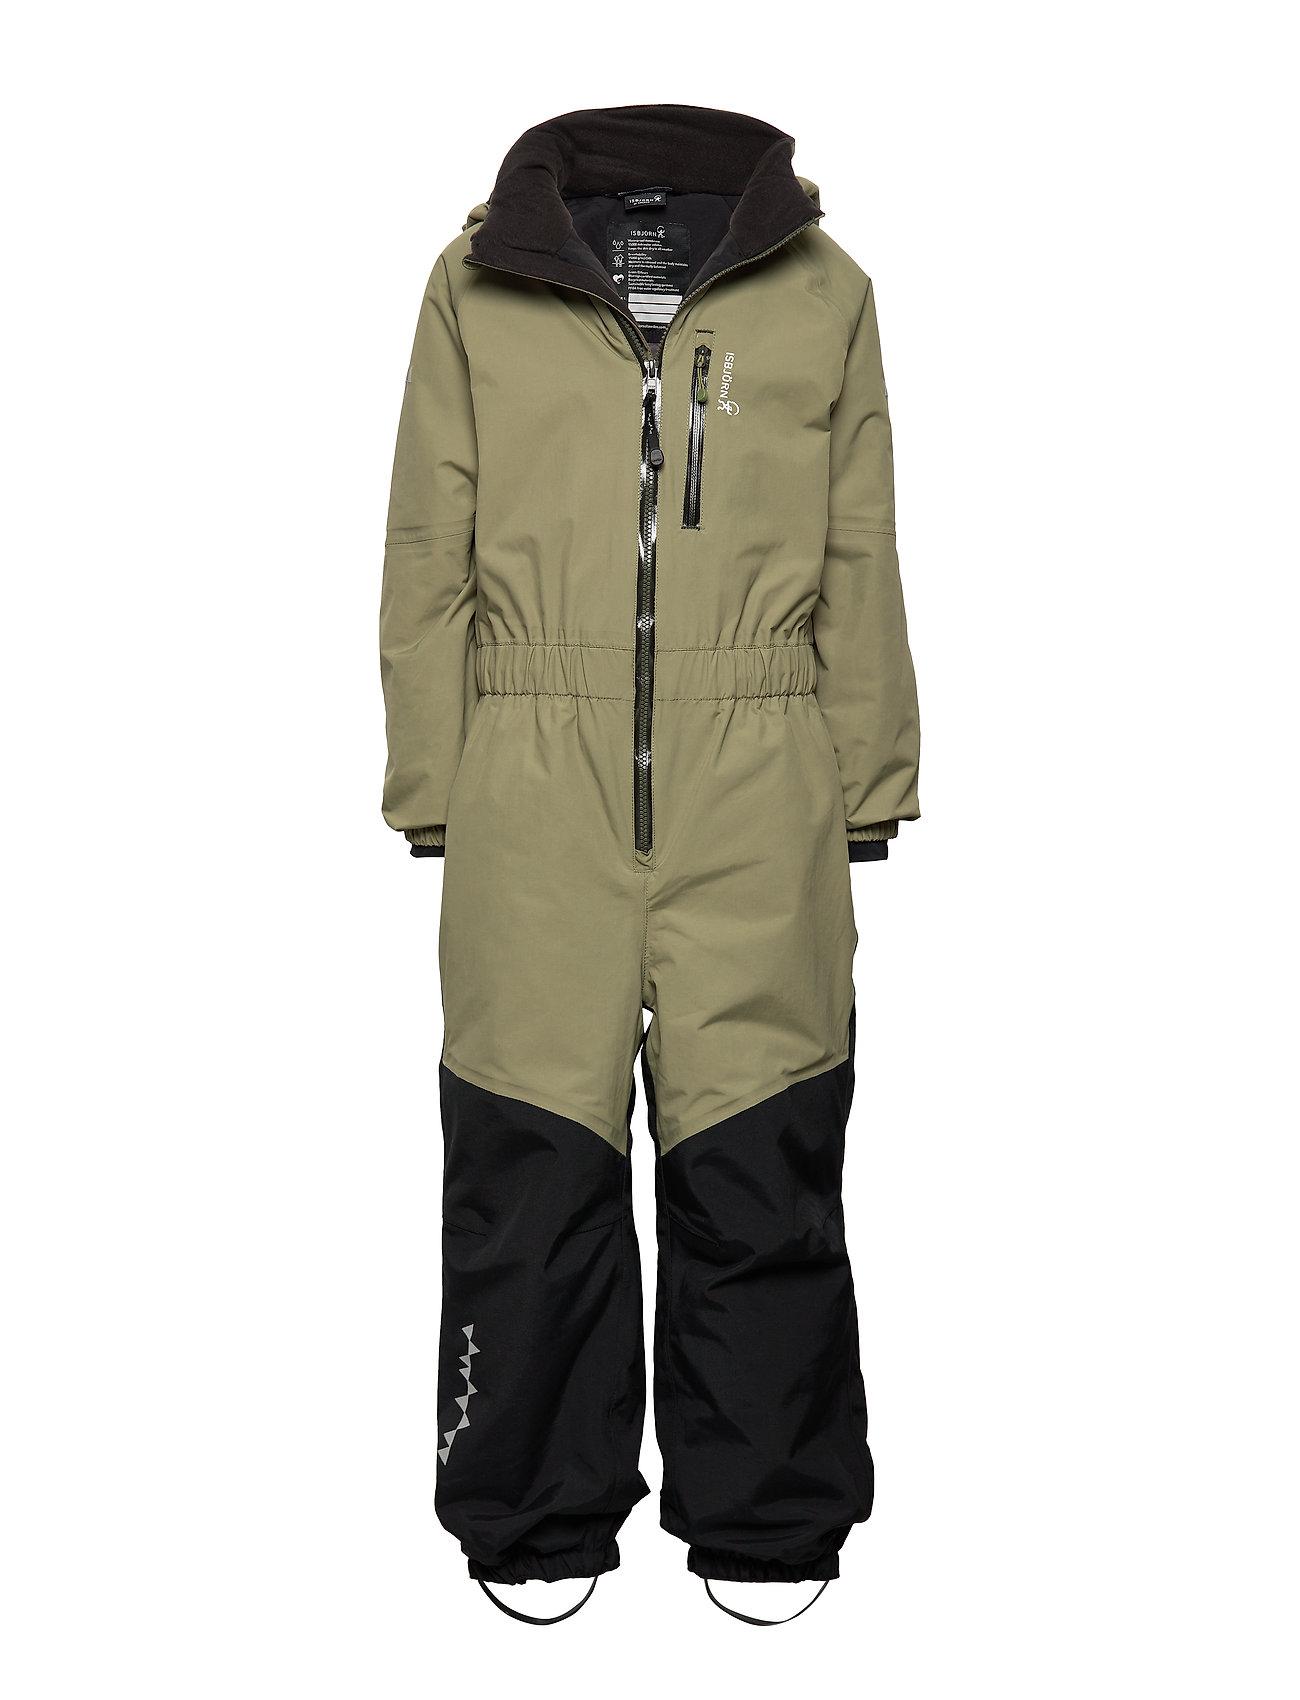 ISBJÖRN of Sweden PENGUIN Snowsuit - MOSS